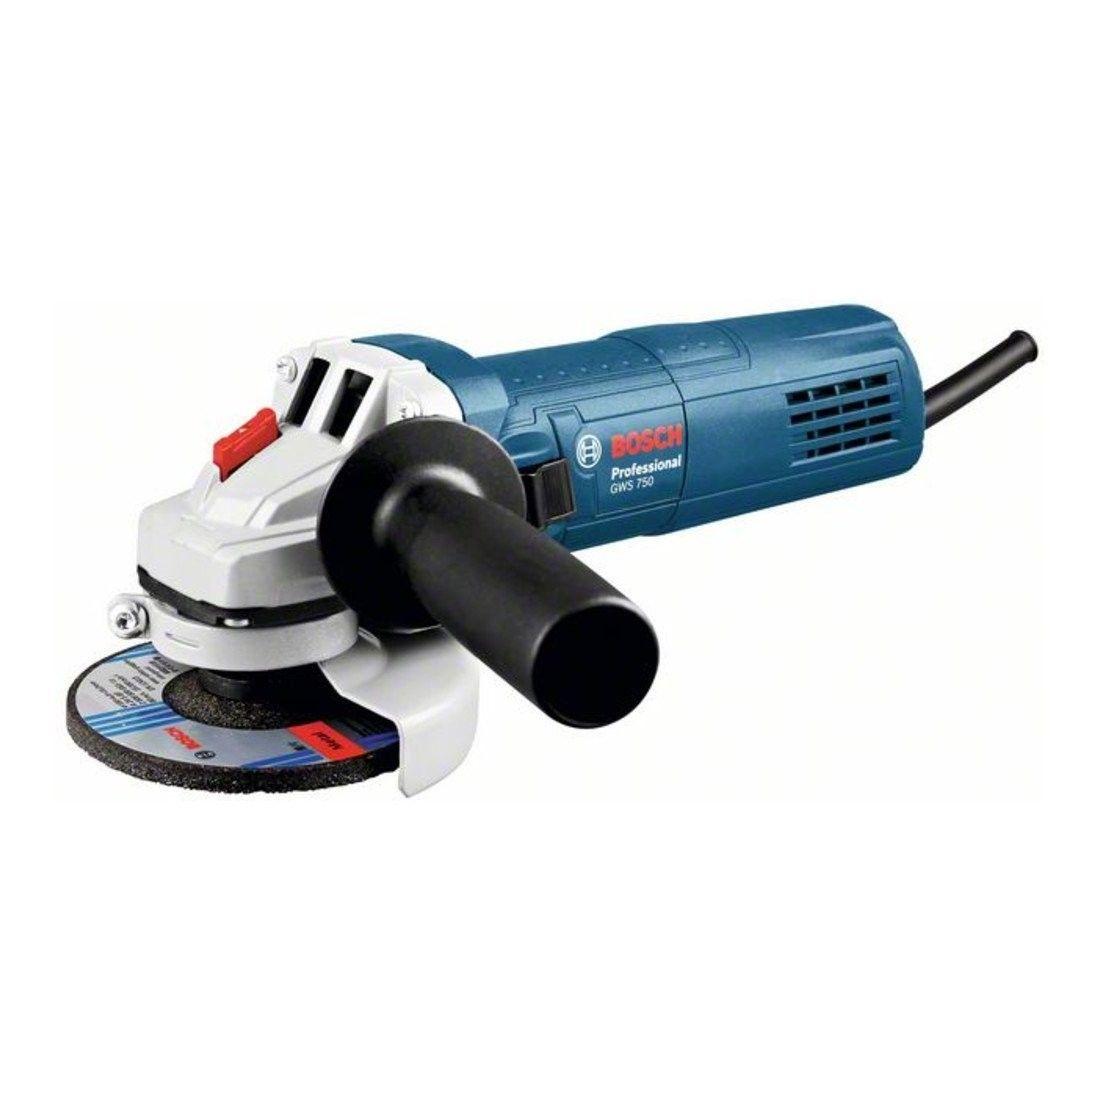 Smerigliatrice Angolare Bosch Professional GWS 750 , 750 W, 115 mm, M 14, Blu